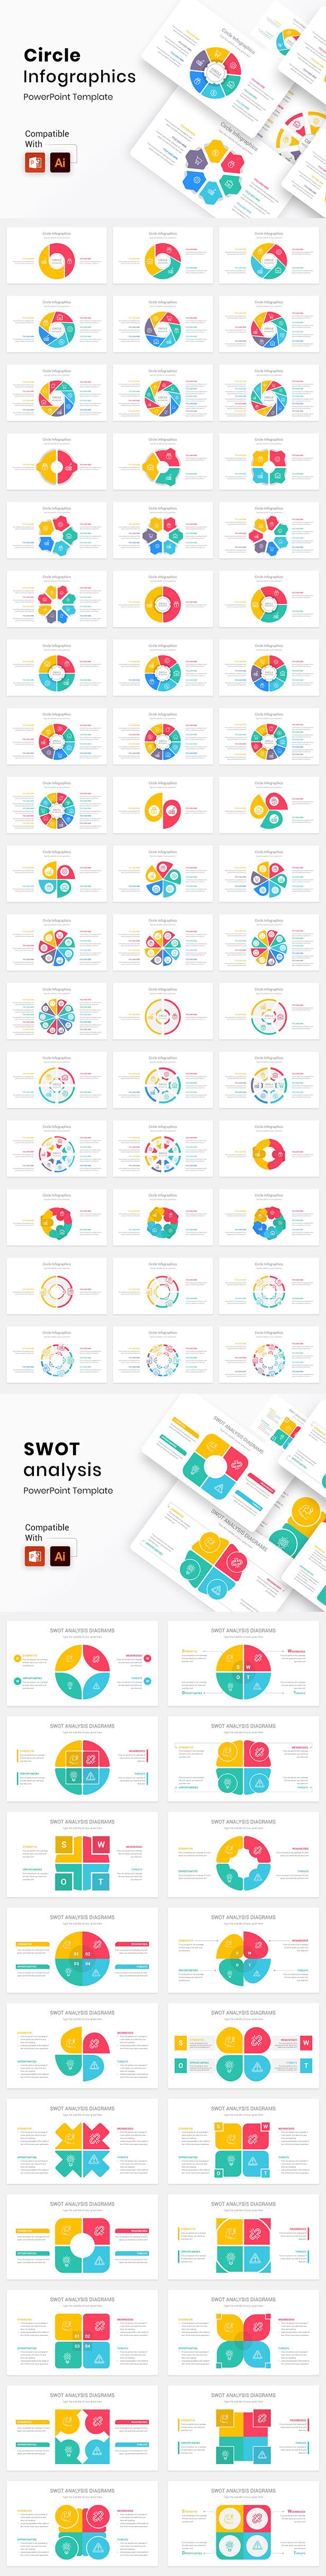 Slide Deck - Multipurpose PowerPoint Template - 2